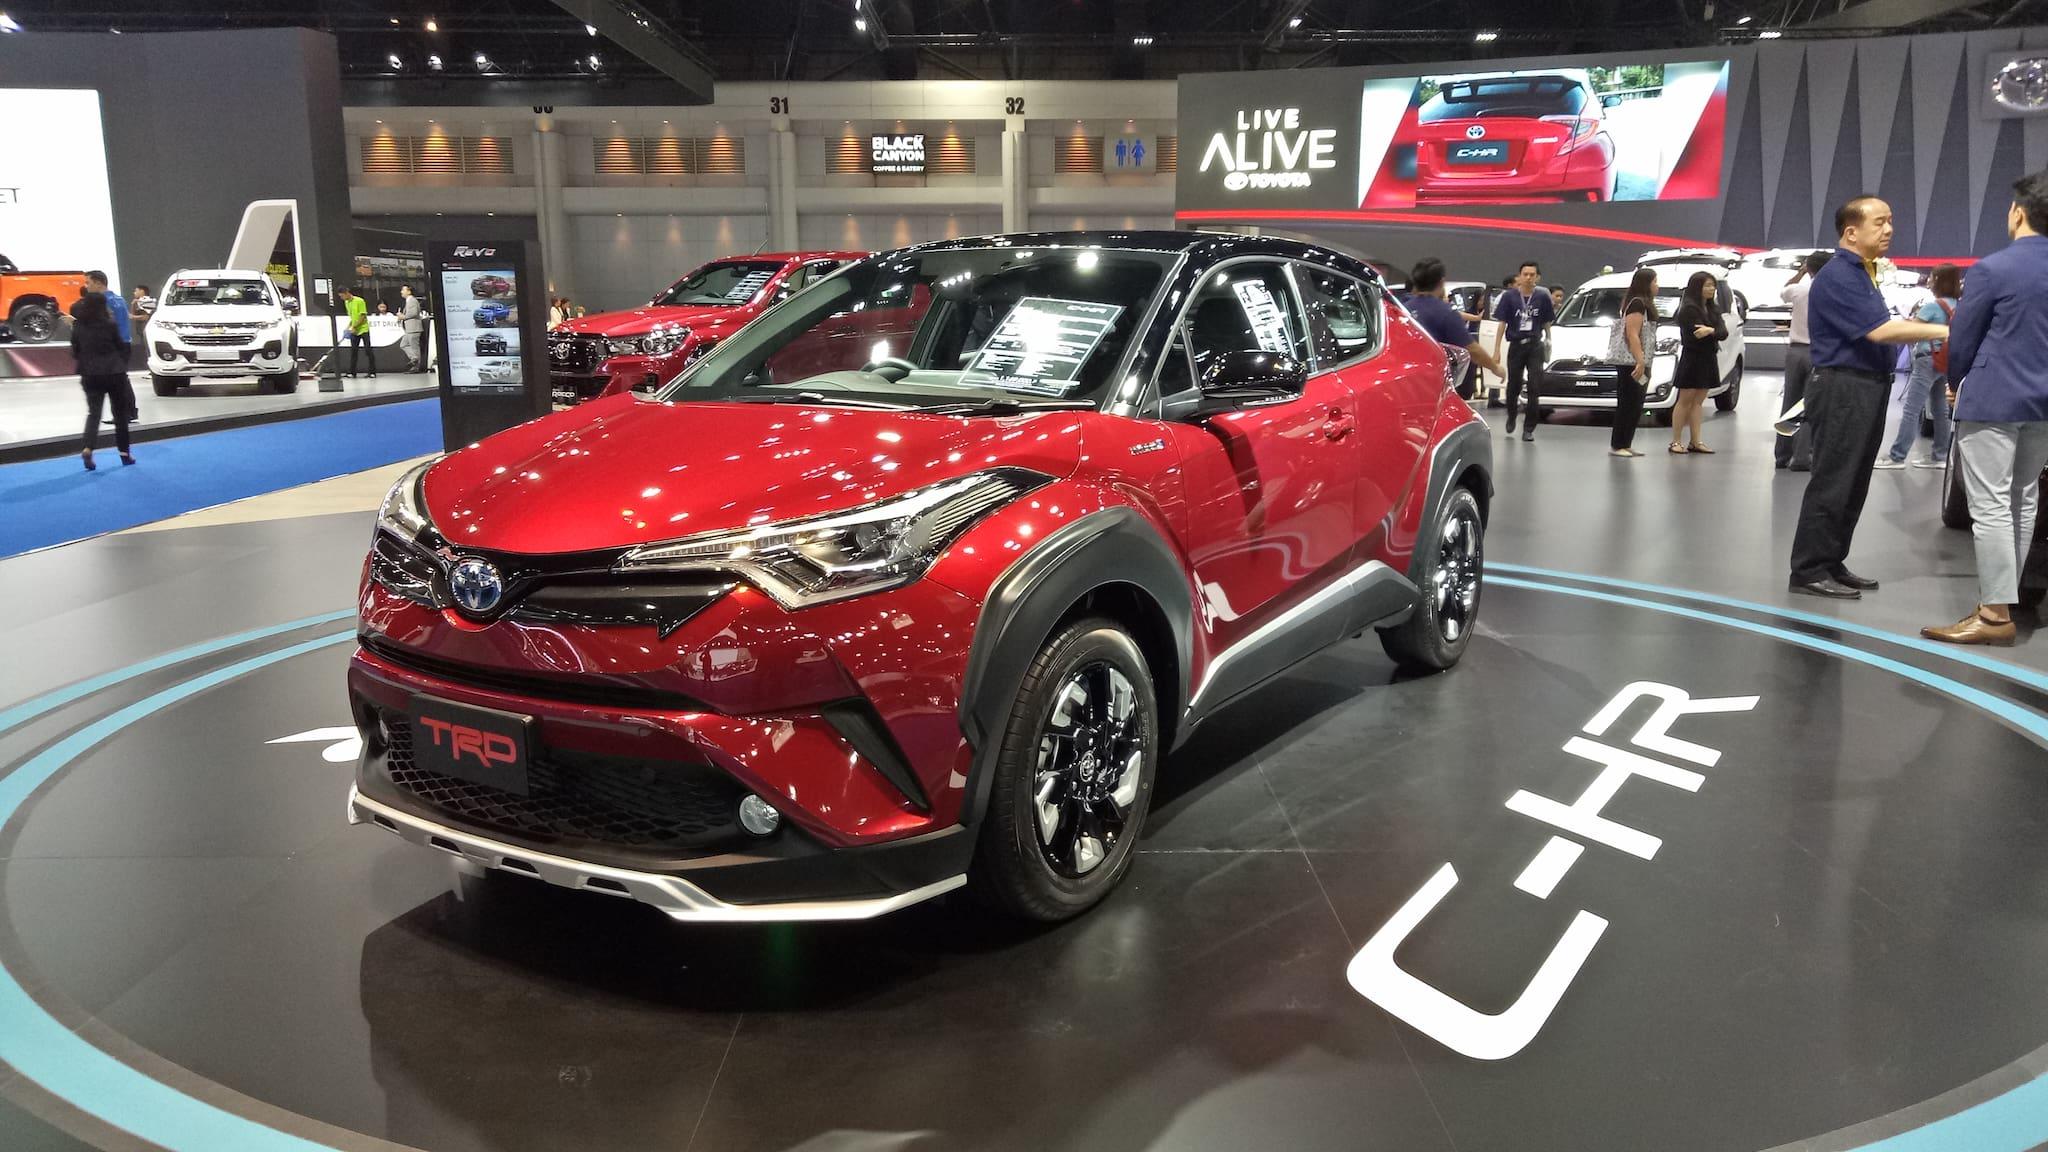 WATCH: A Peek at the 2018 Bangkok International Motor Show